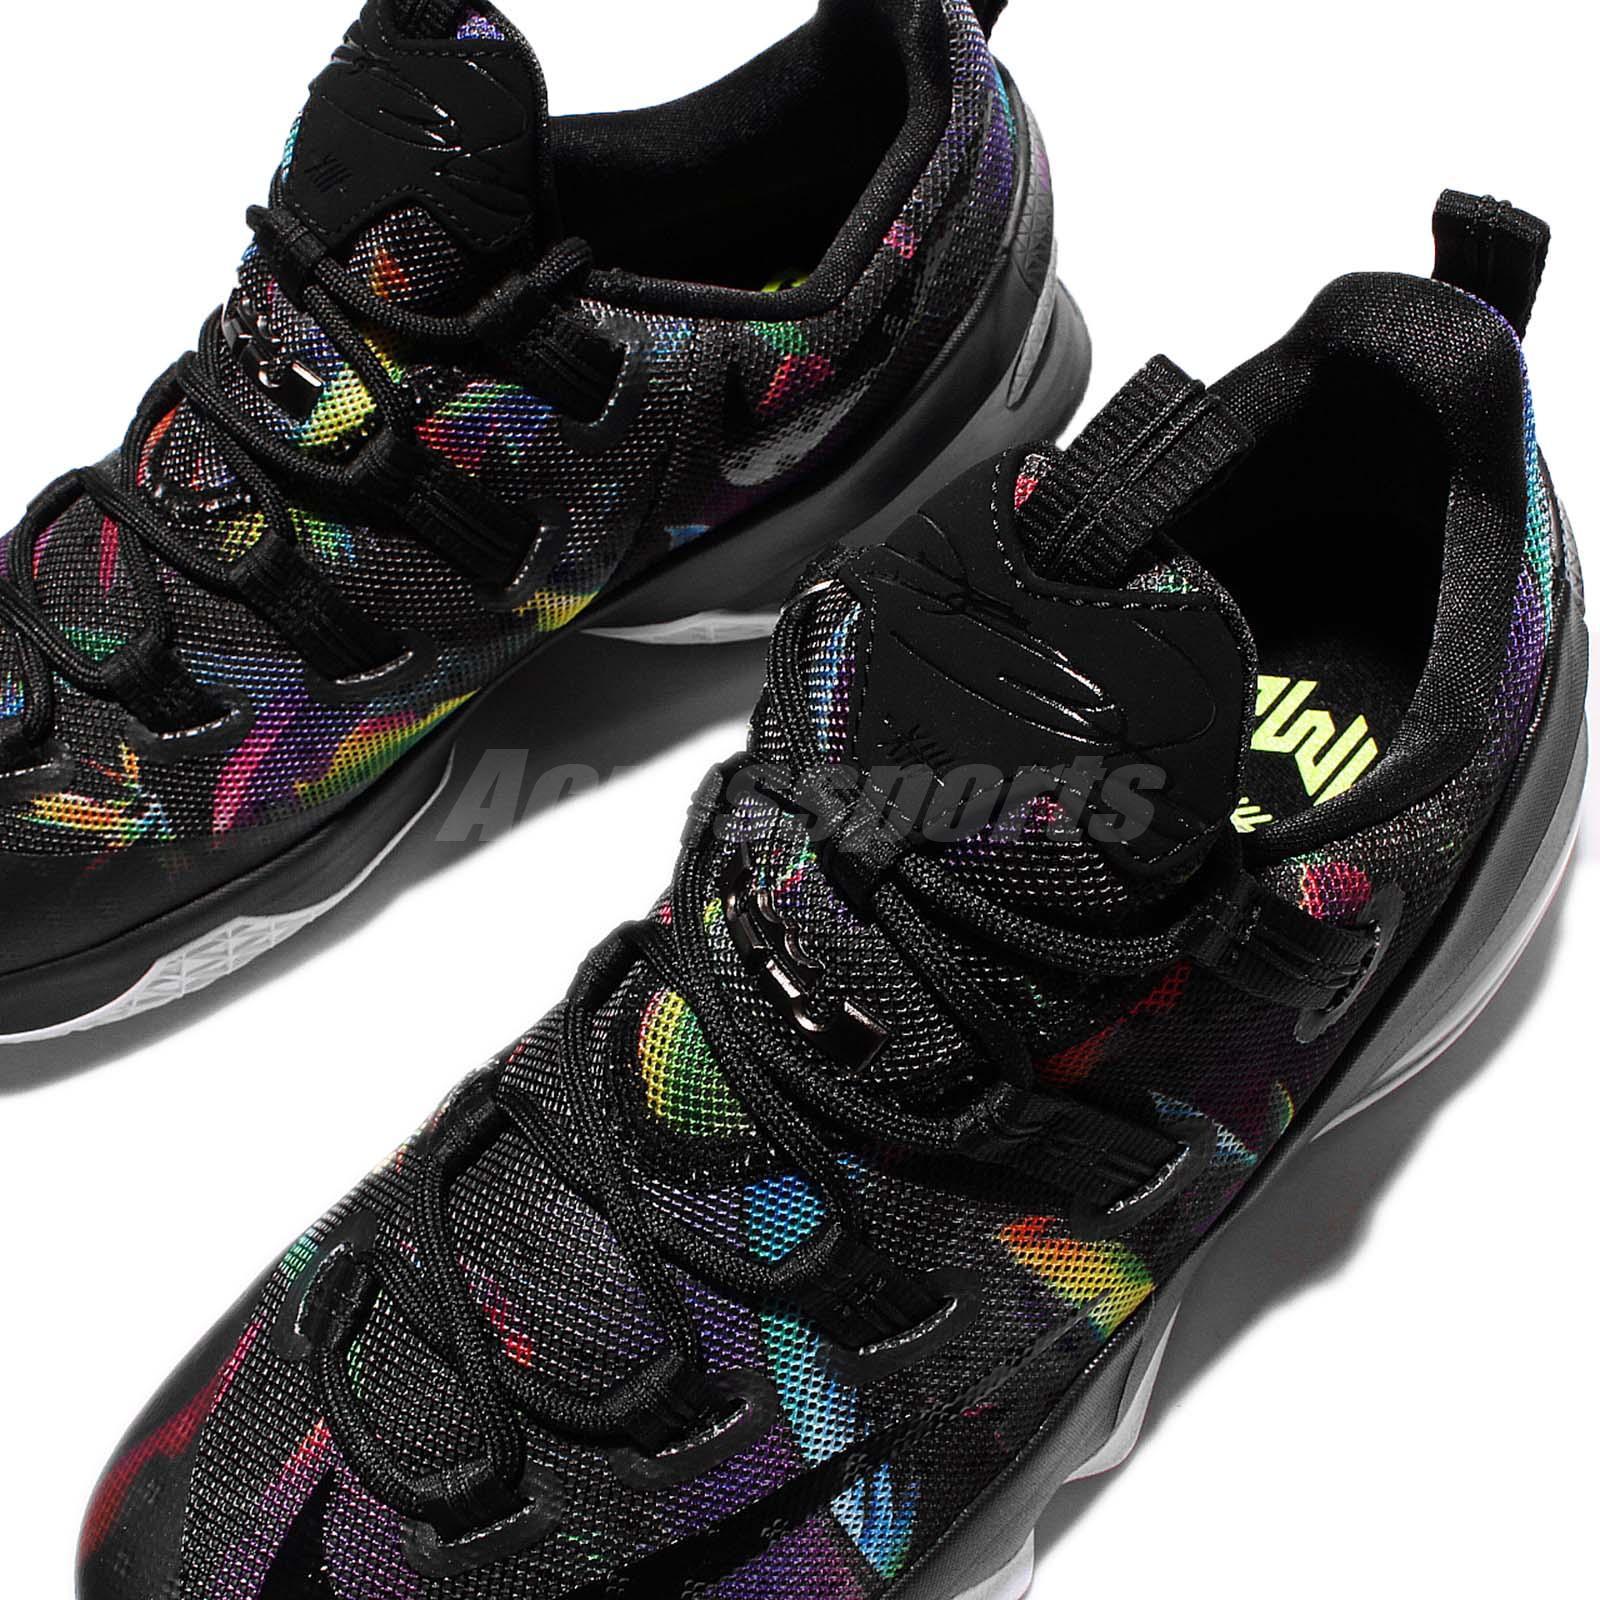 d0fab618167 Nike Lebron XIII bajo EP James 13 aves del paraíso Negro Arco Iris ...